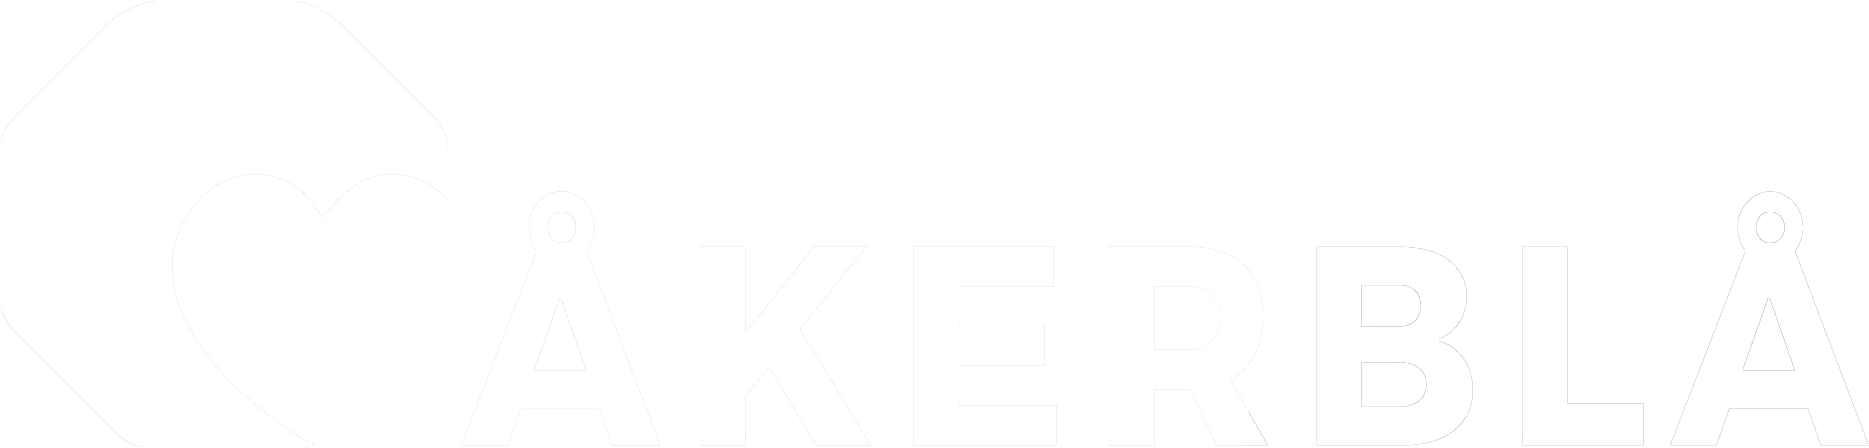 Åkerblå logo